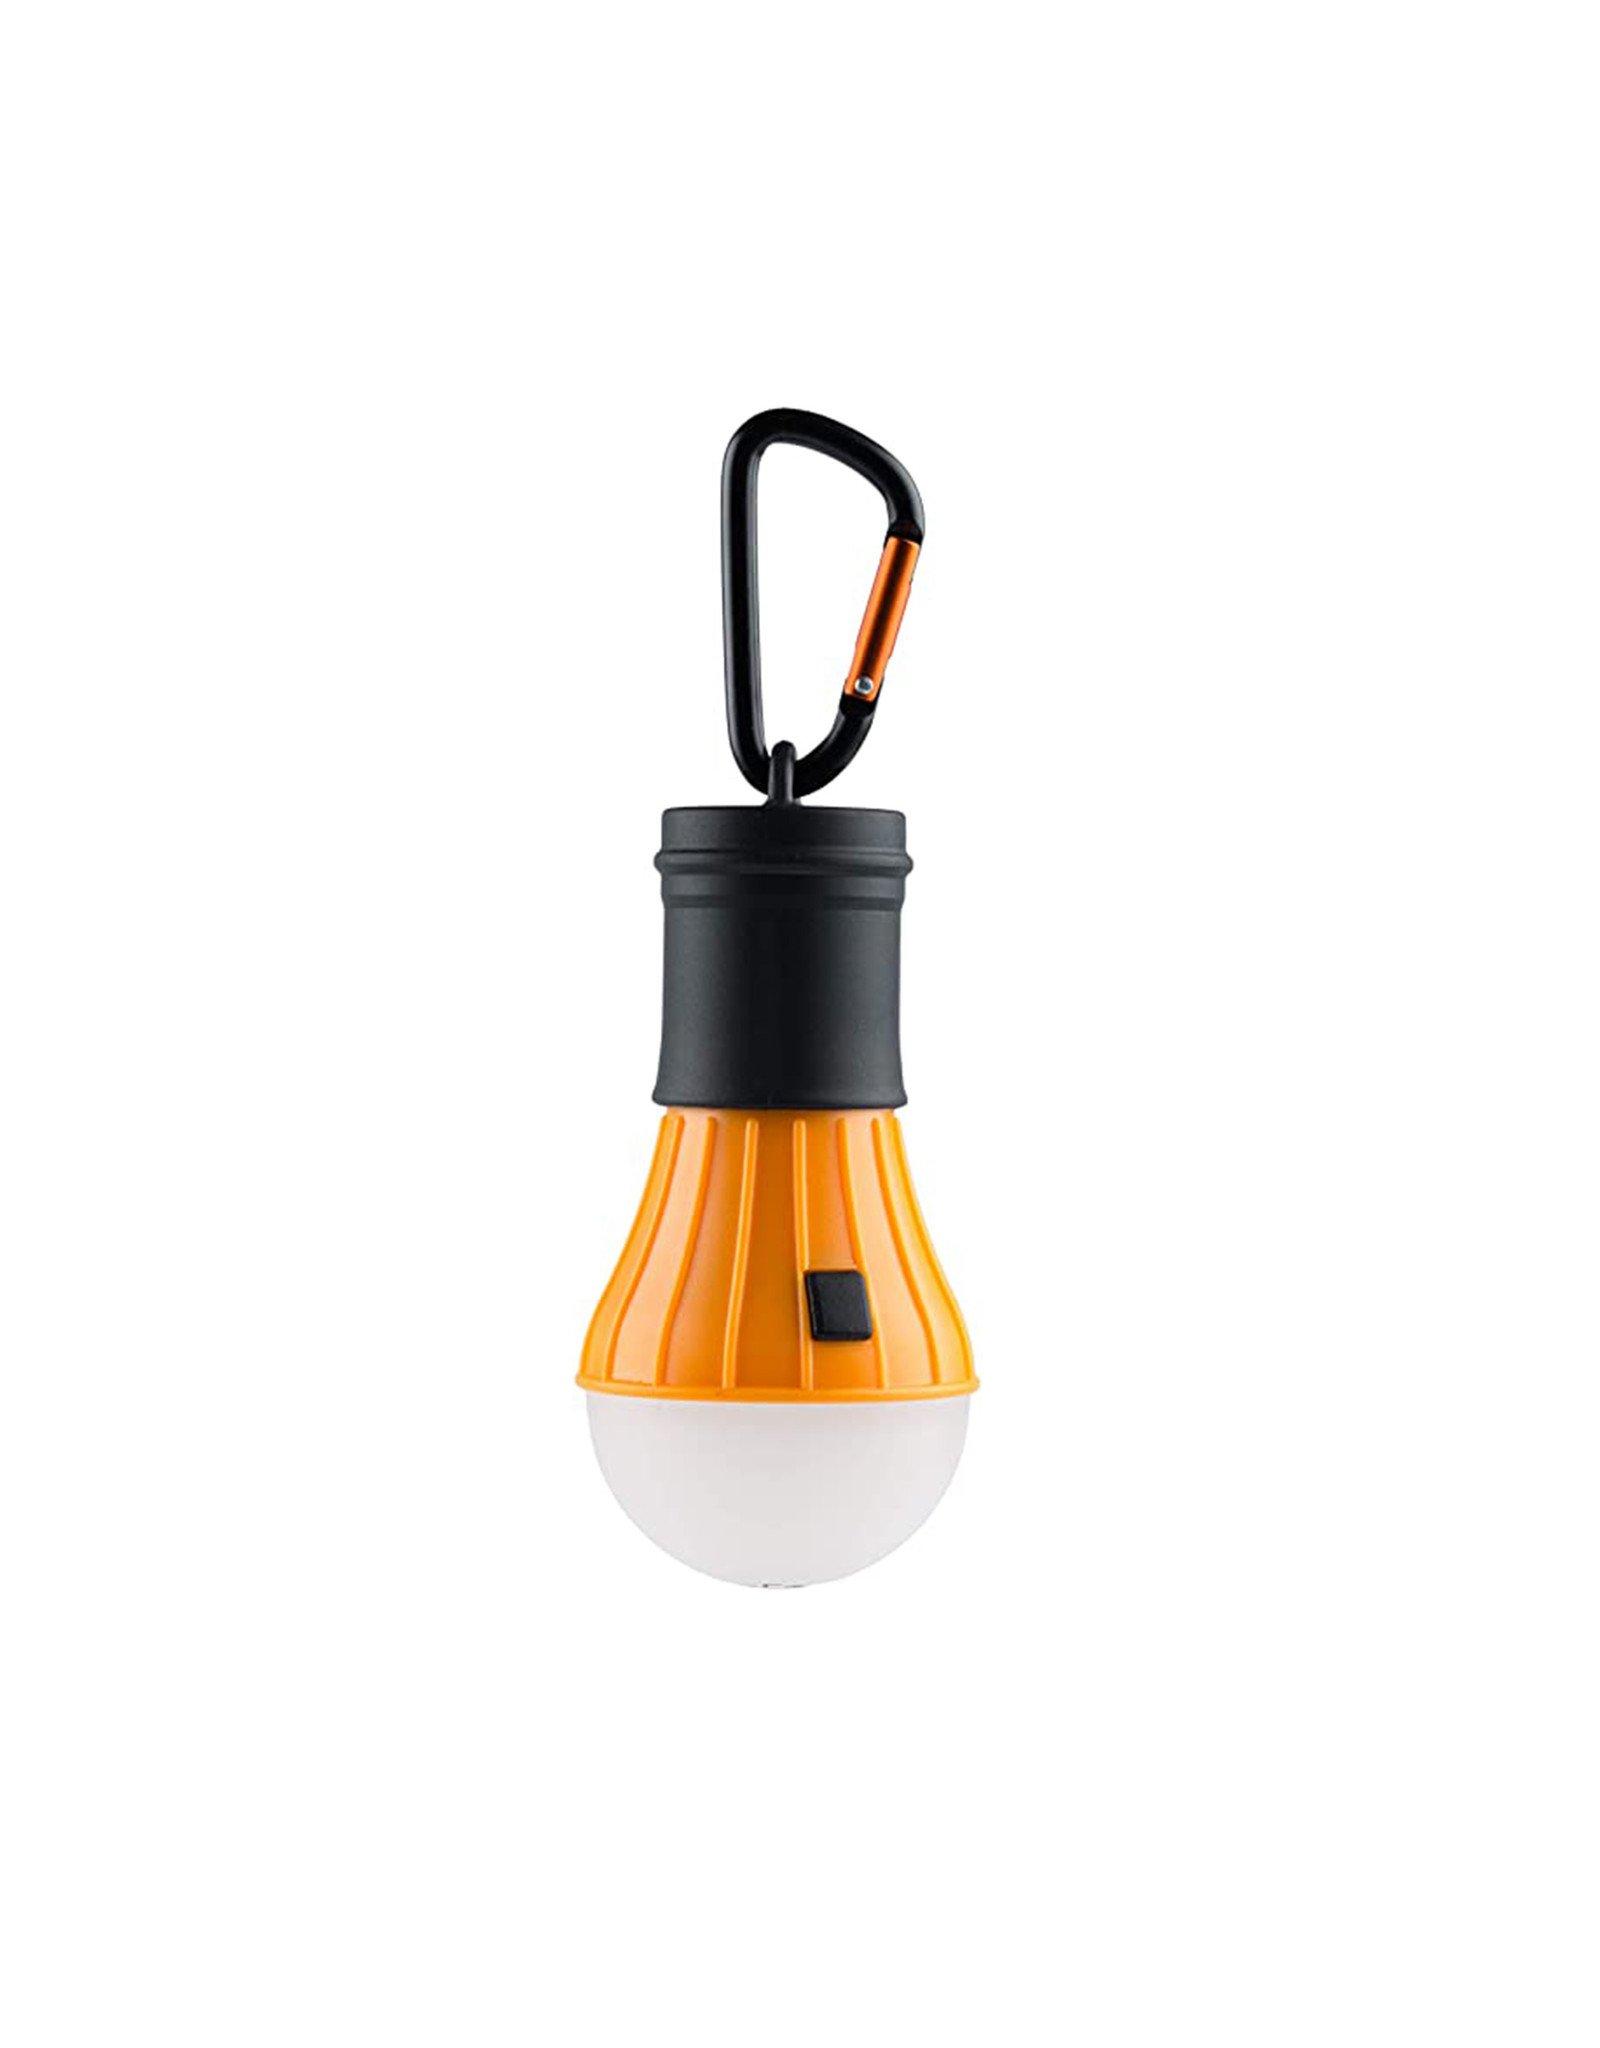 Ace Camp LED Tent Lamp